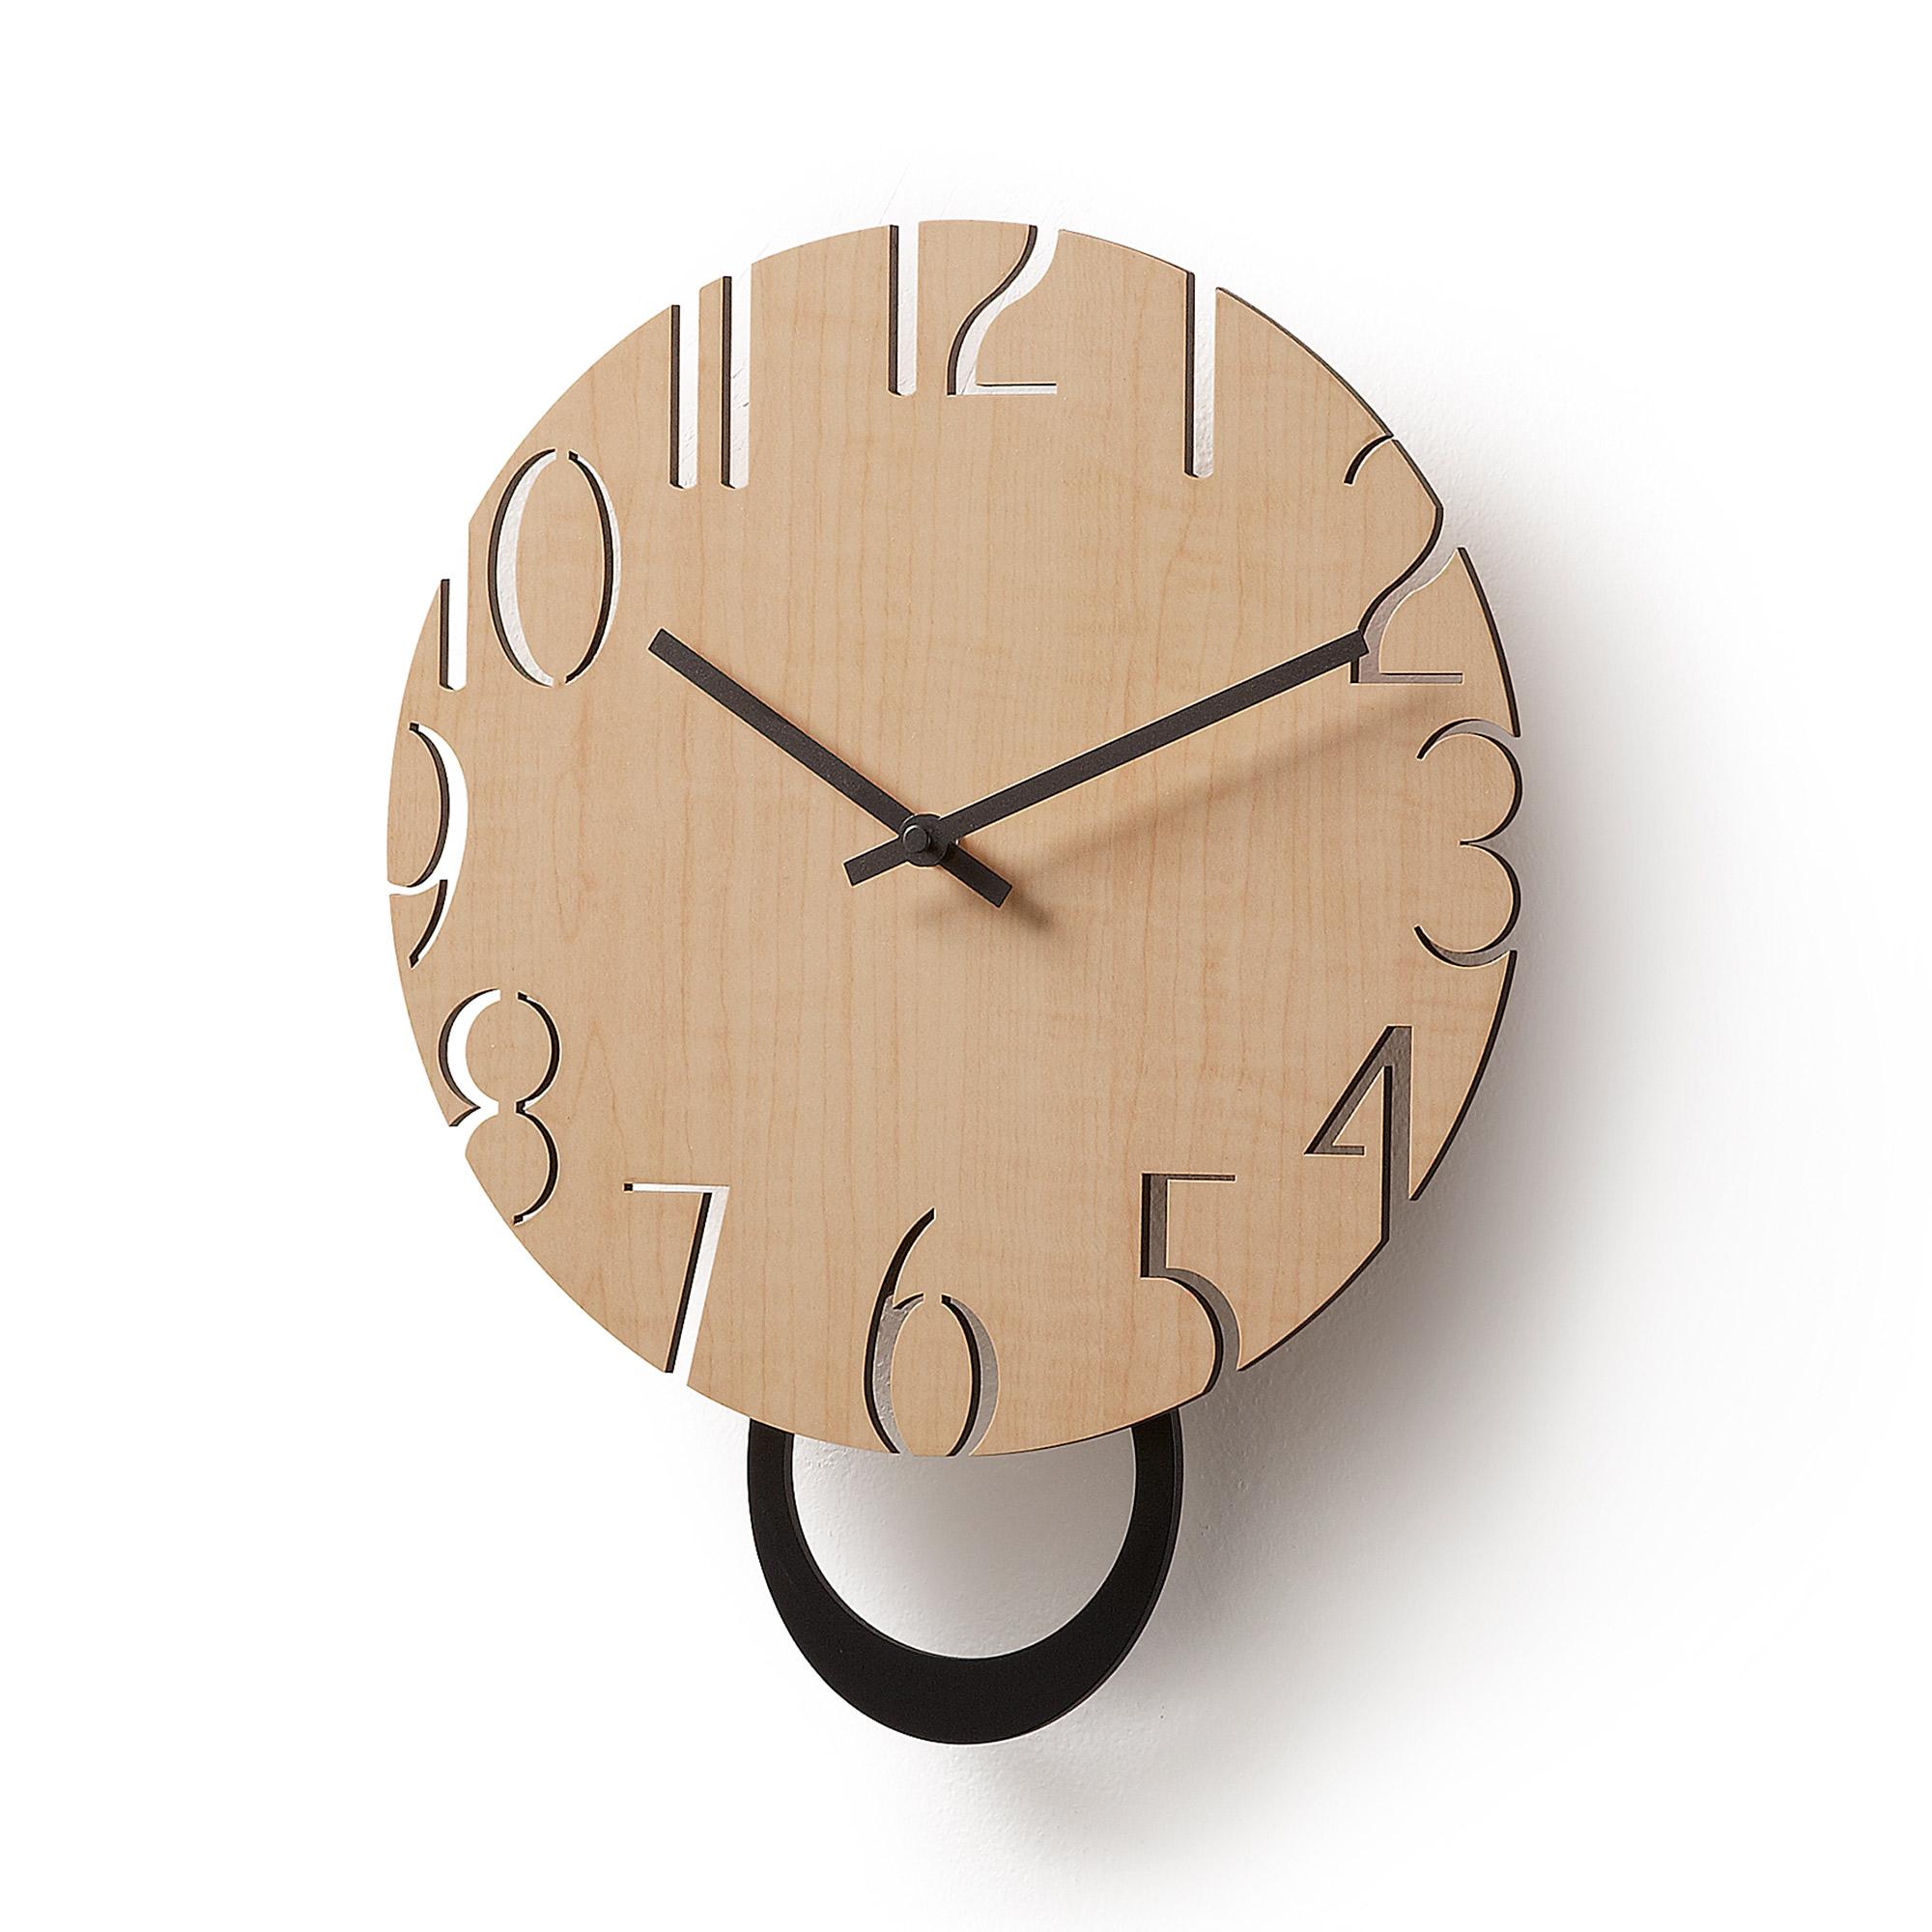 Kave Home - Peters Wanduhr Ø 30 cm   Dekoration > Uhren > Wanduhren   Kave Home